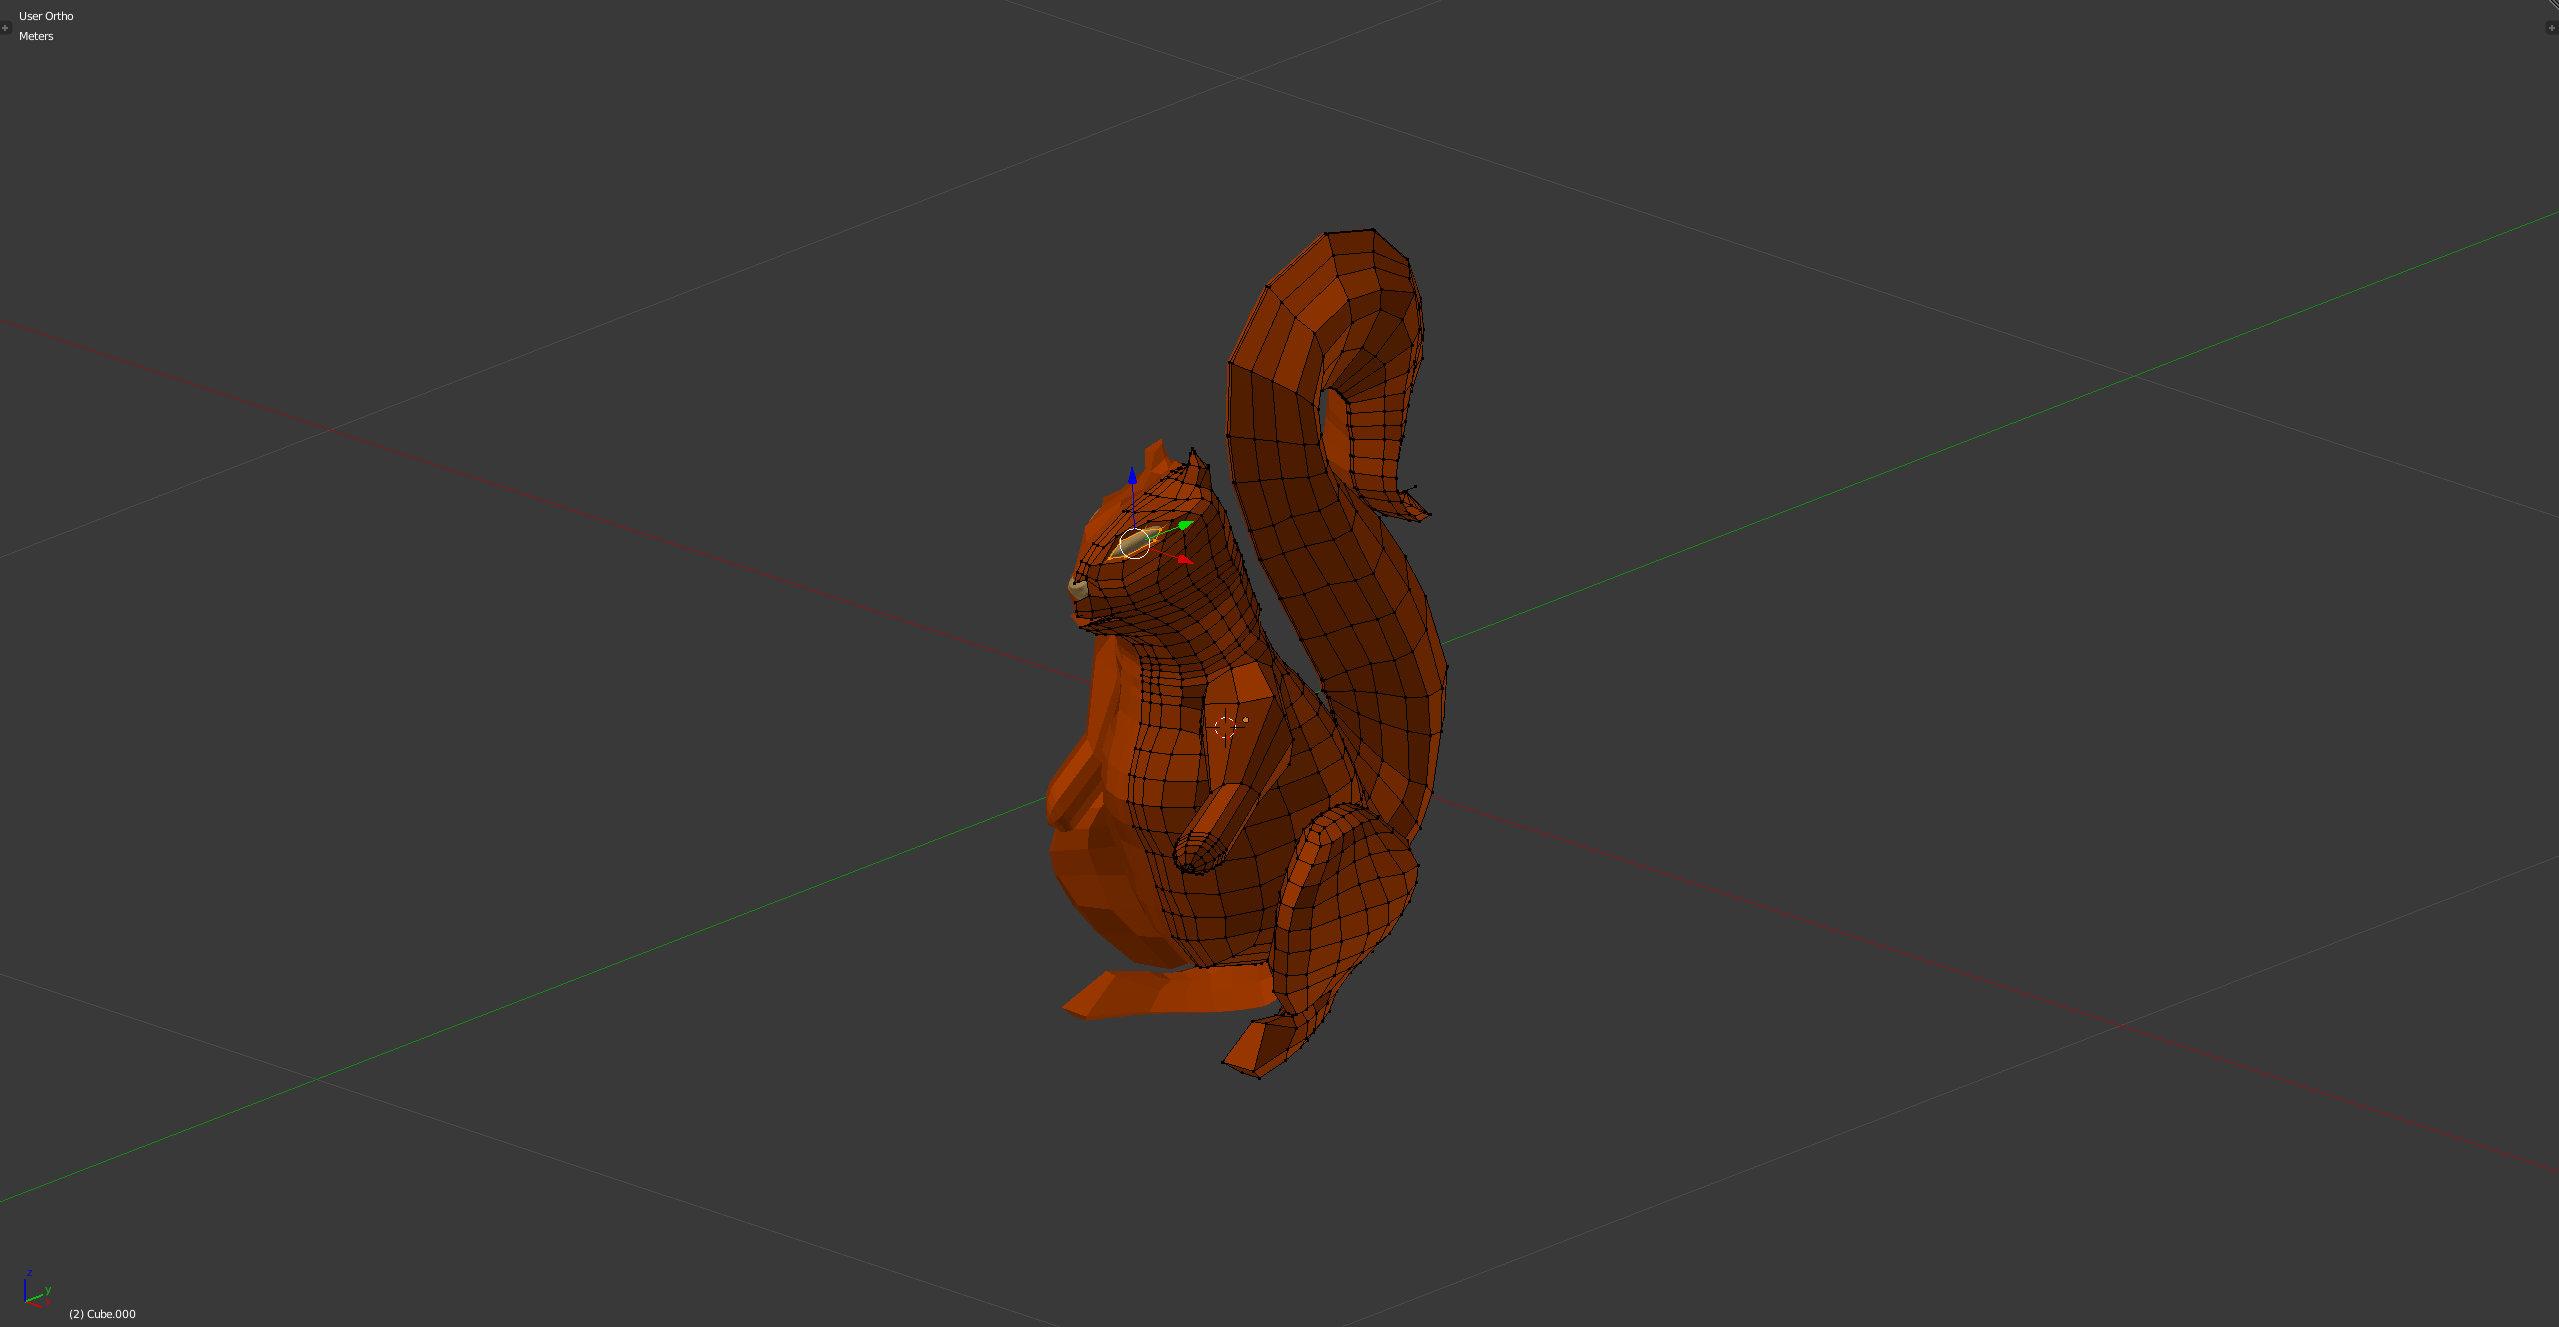 3D-Grafik Blender Wireframe solid - Eichhörnchen